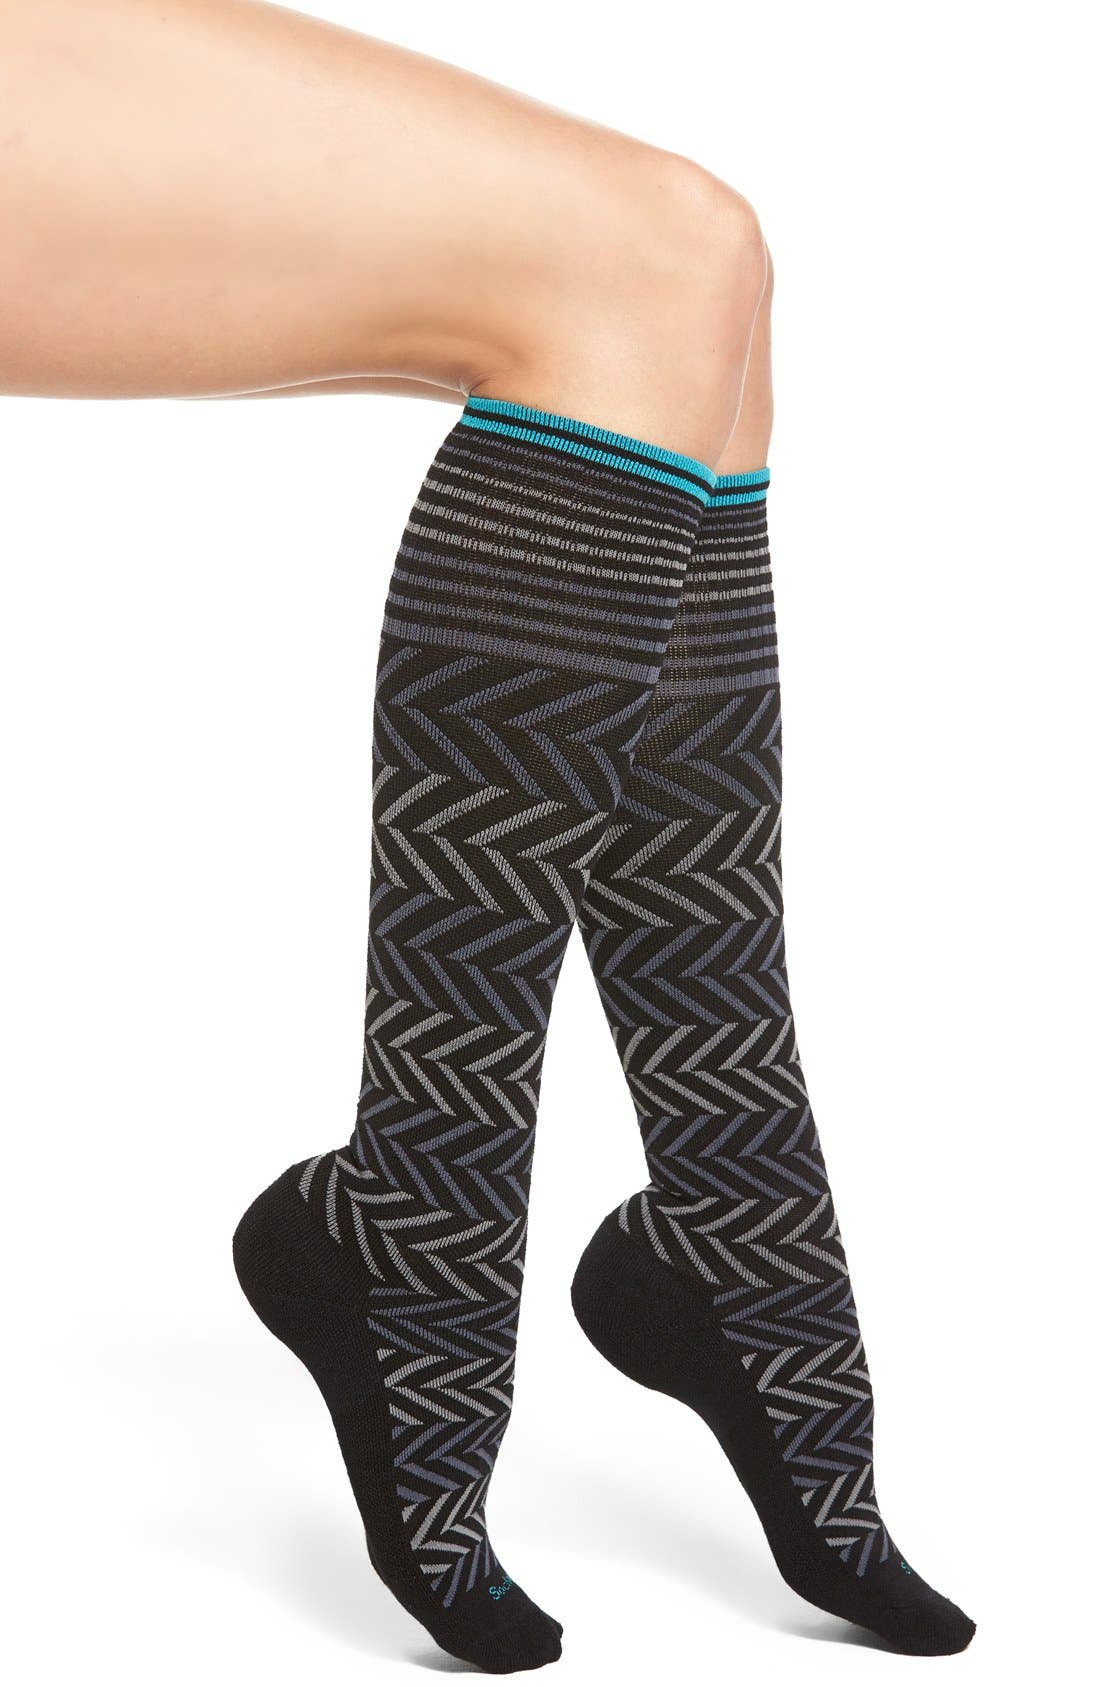 Graduated Compression Socks,                         Main,                         color, Black